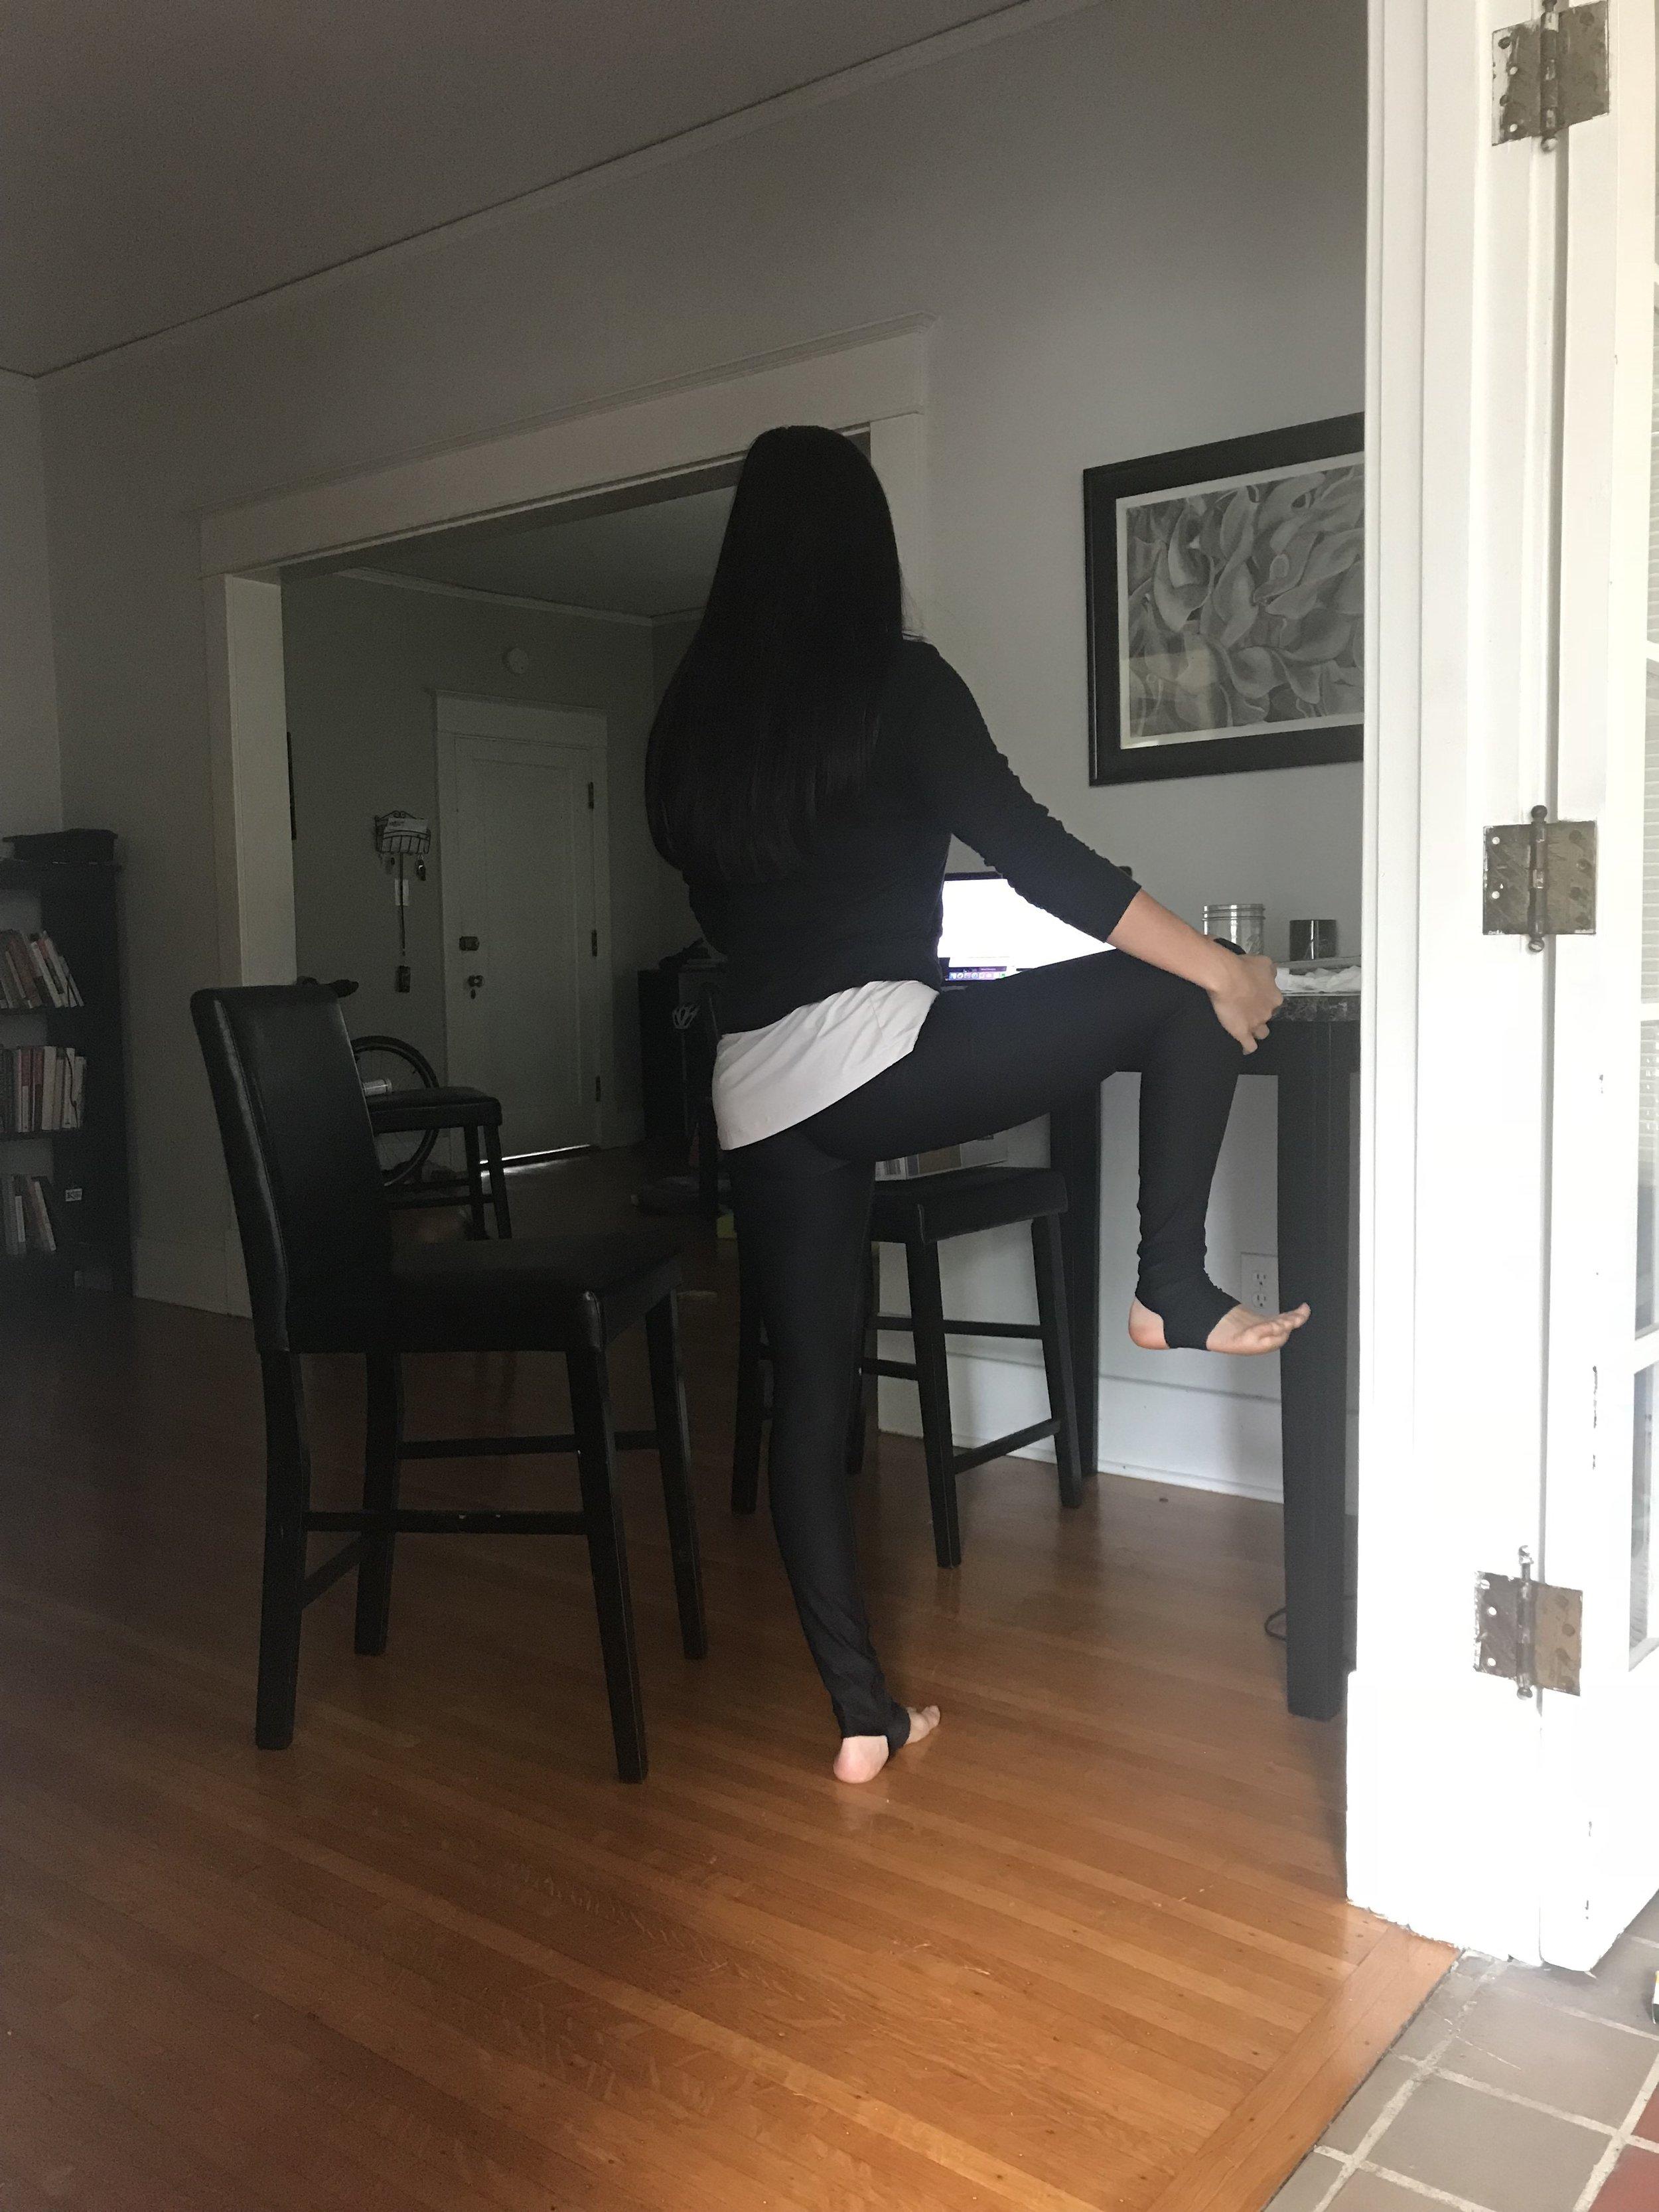 Hailey Heishman extended leg raise pose